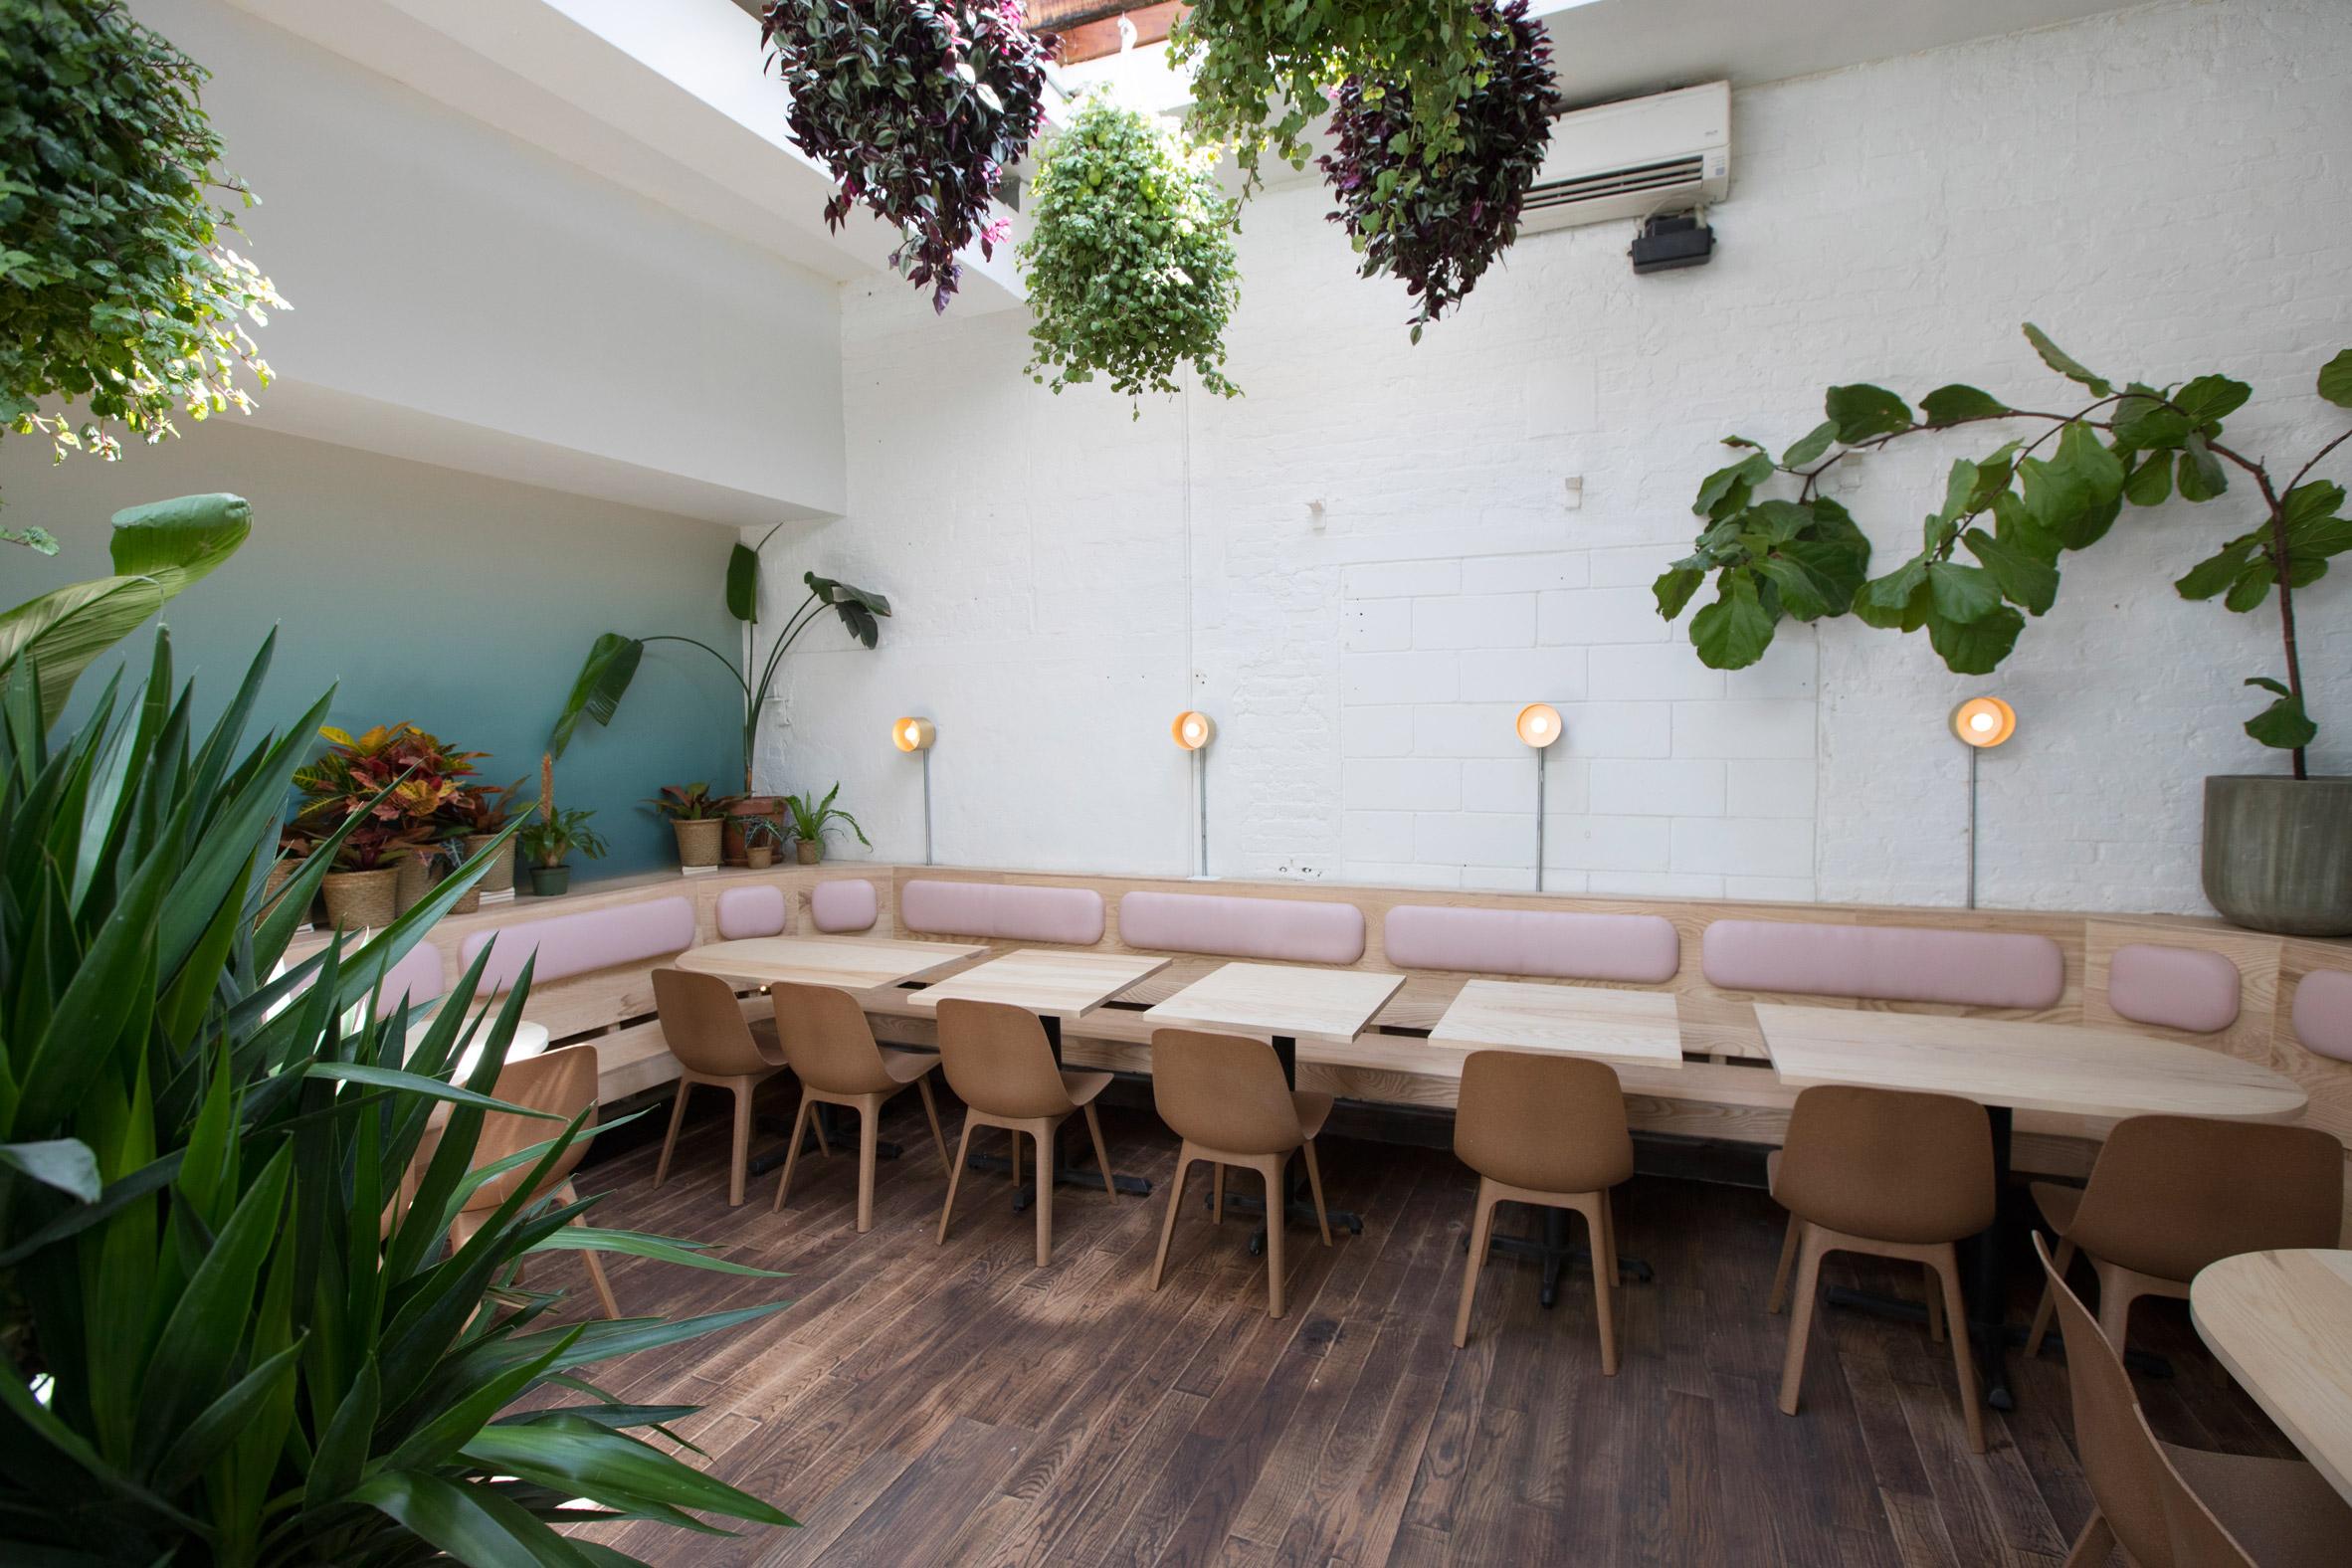 di-an-di-huy-bui-interiors-restaurant-brooklyn-new-york-usa_dezeen_2364_col_1.jpg